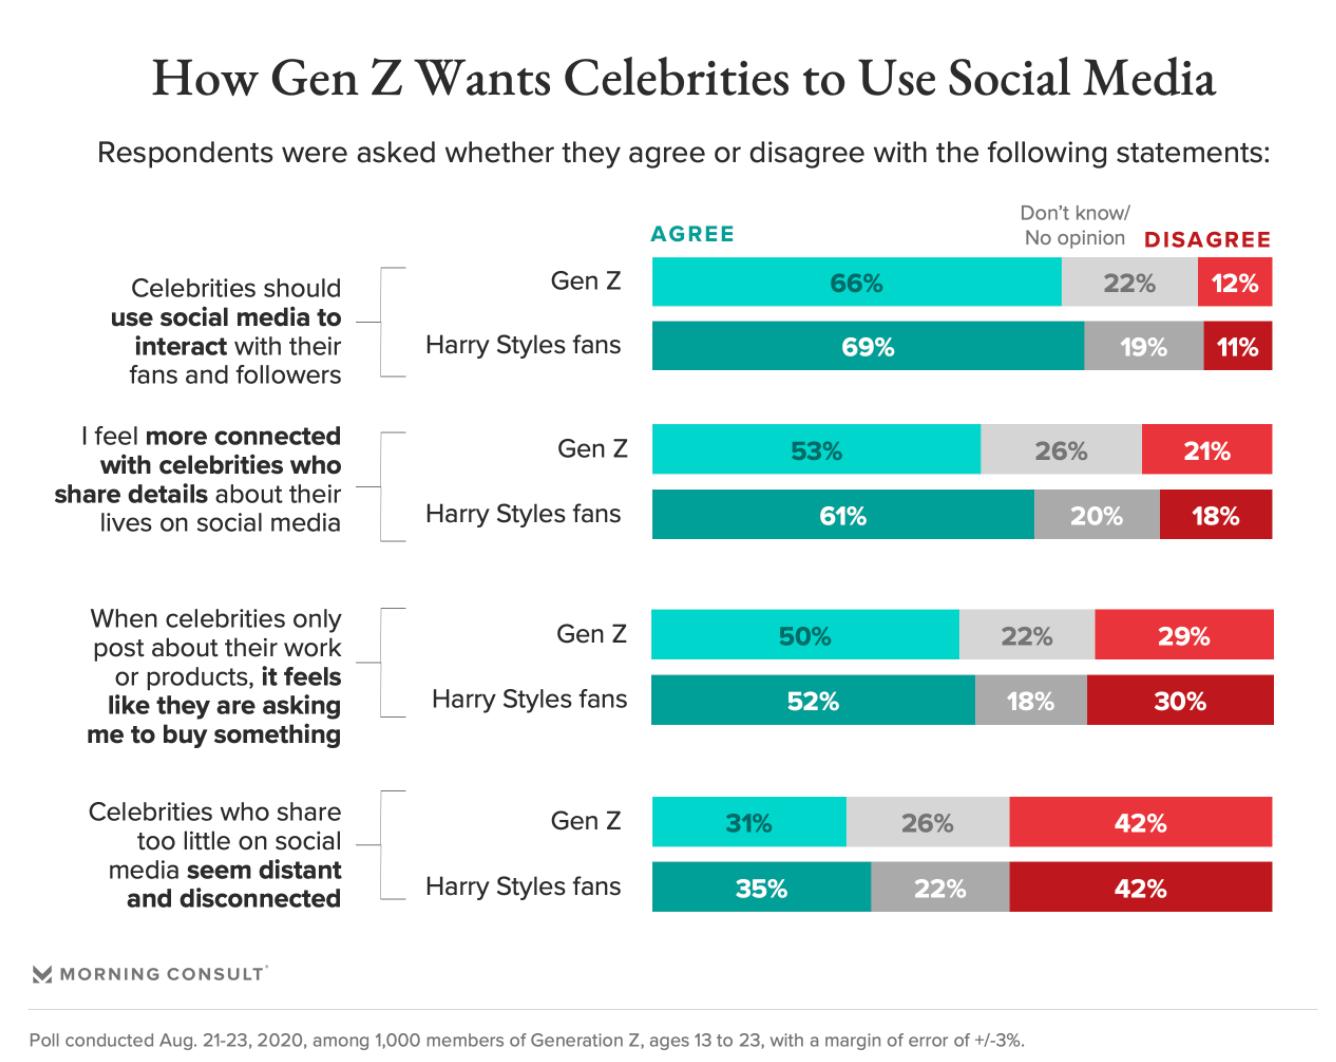 How Gen Z wants celebrities to use social media